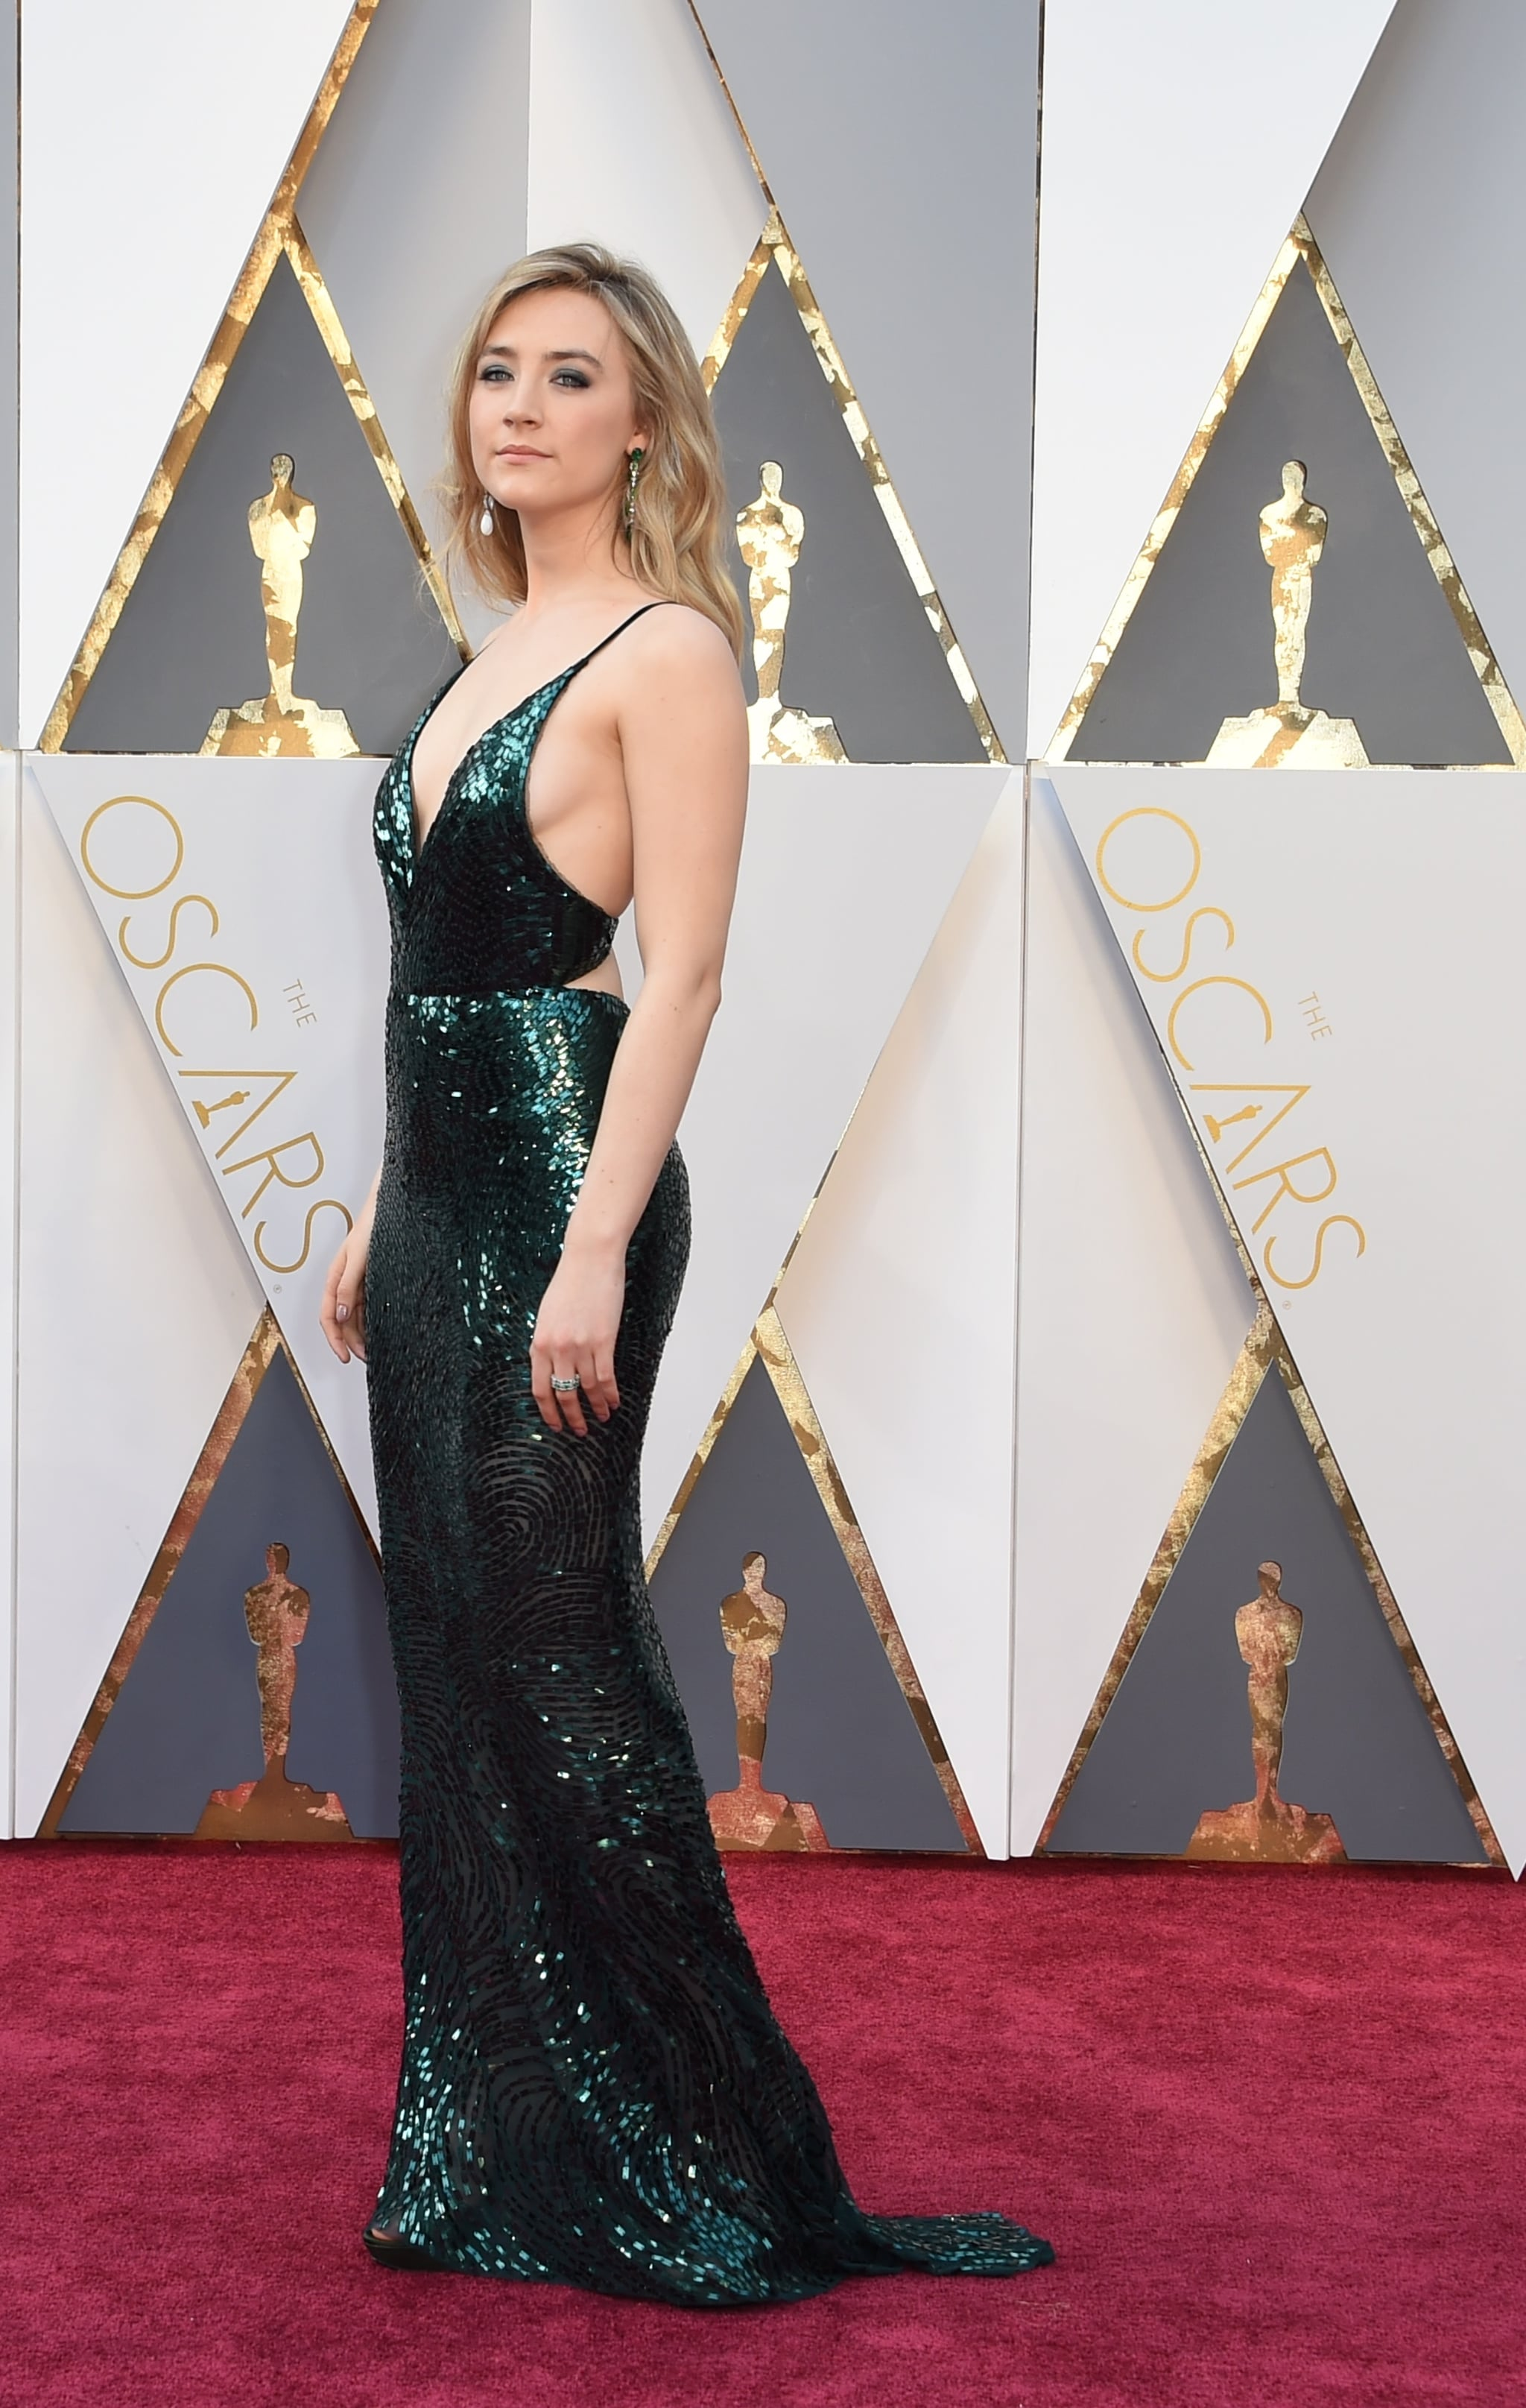 Scarlett Johansson Is Fashionably Late but Still Looks